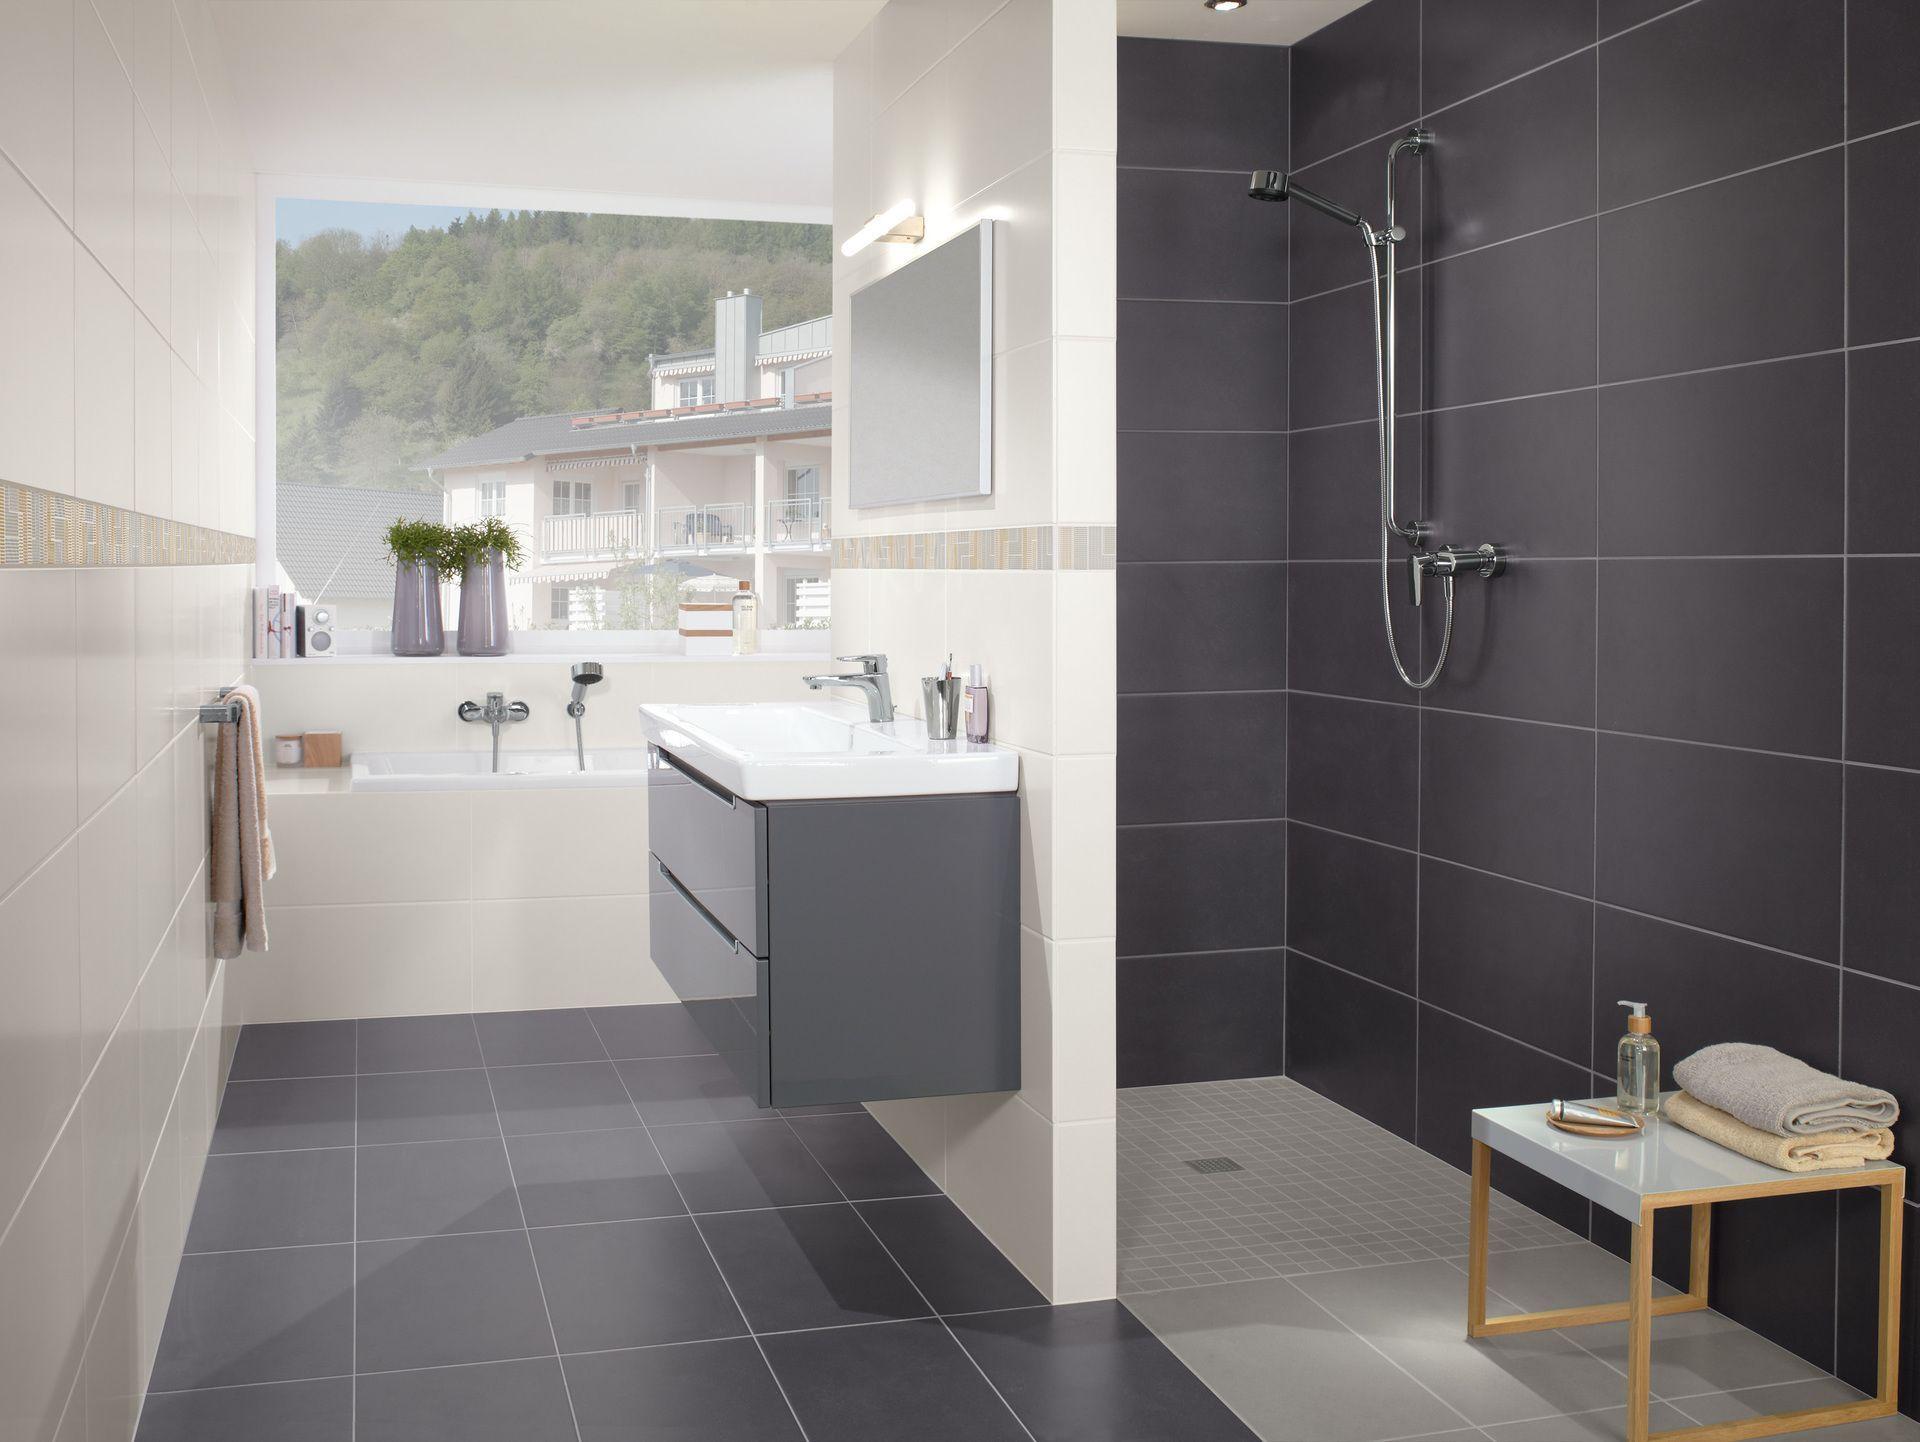 k chenfliesen wand swalif. Black Bedroom Furniture Sets. Home Design Ideas